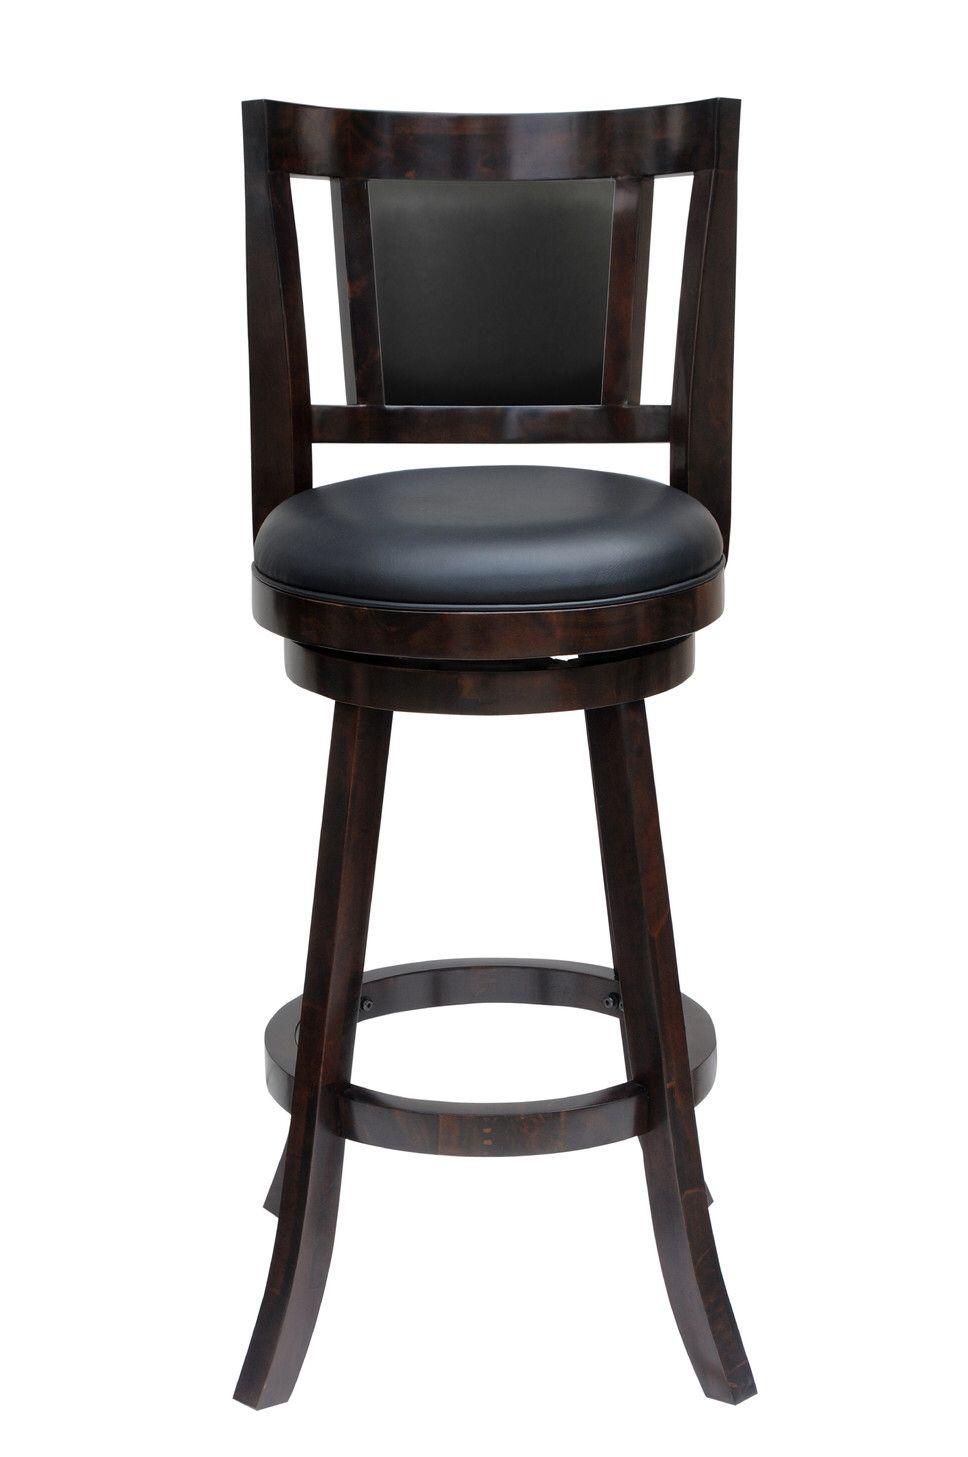 "Avianna 24"" Swivel Bar Stool with Cushion"